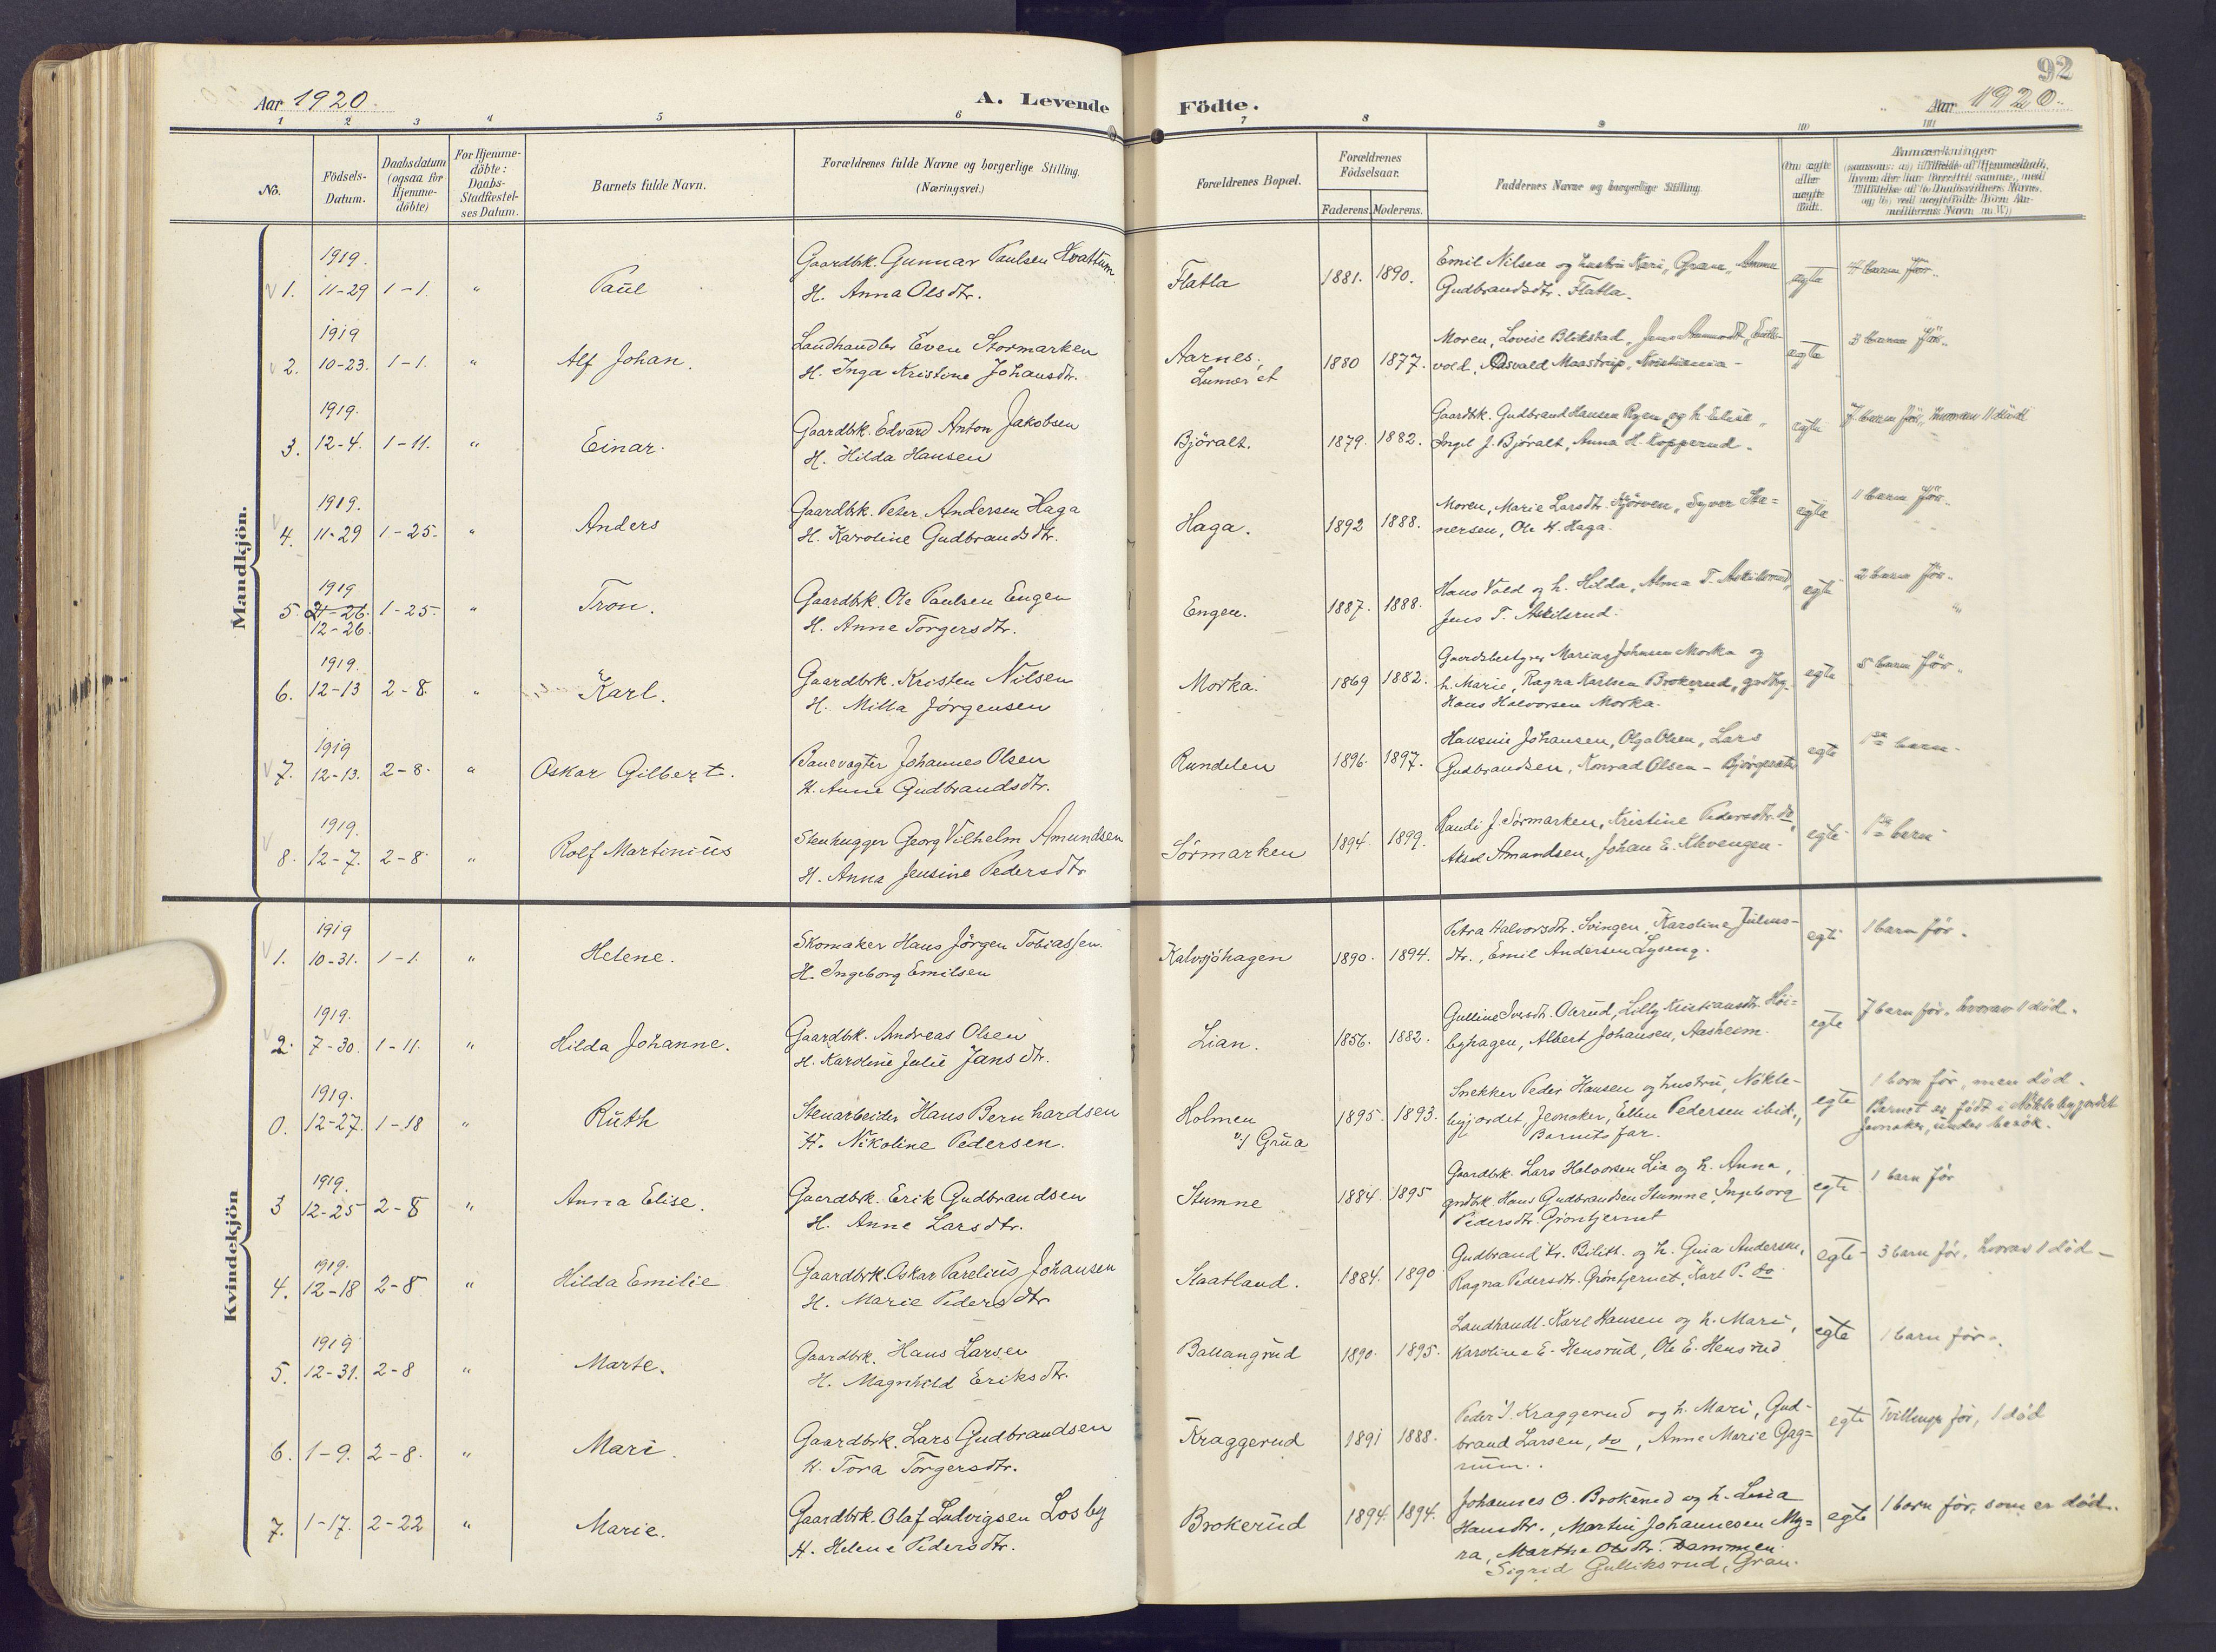 SAH, Lunner prestekontor, H/Ha/Haa/L0001: Ministerialbok nr. 1, 1907-1922, s. 92